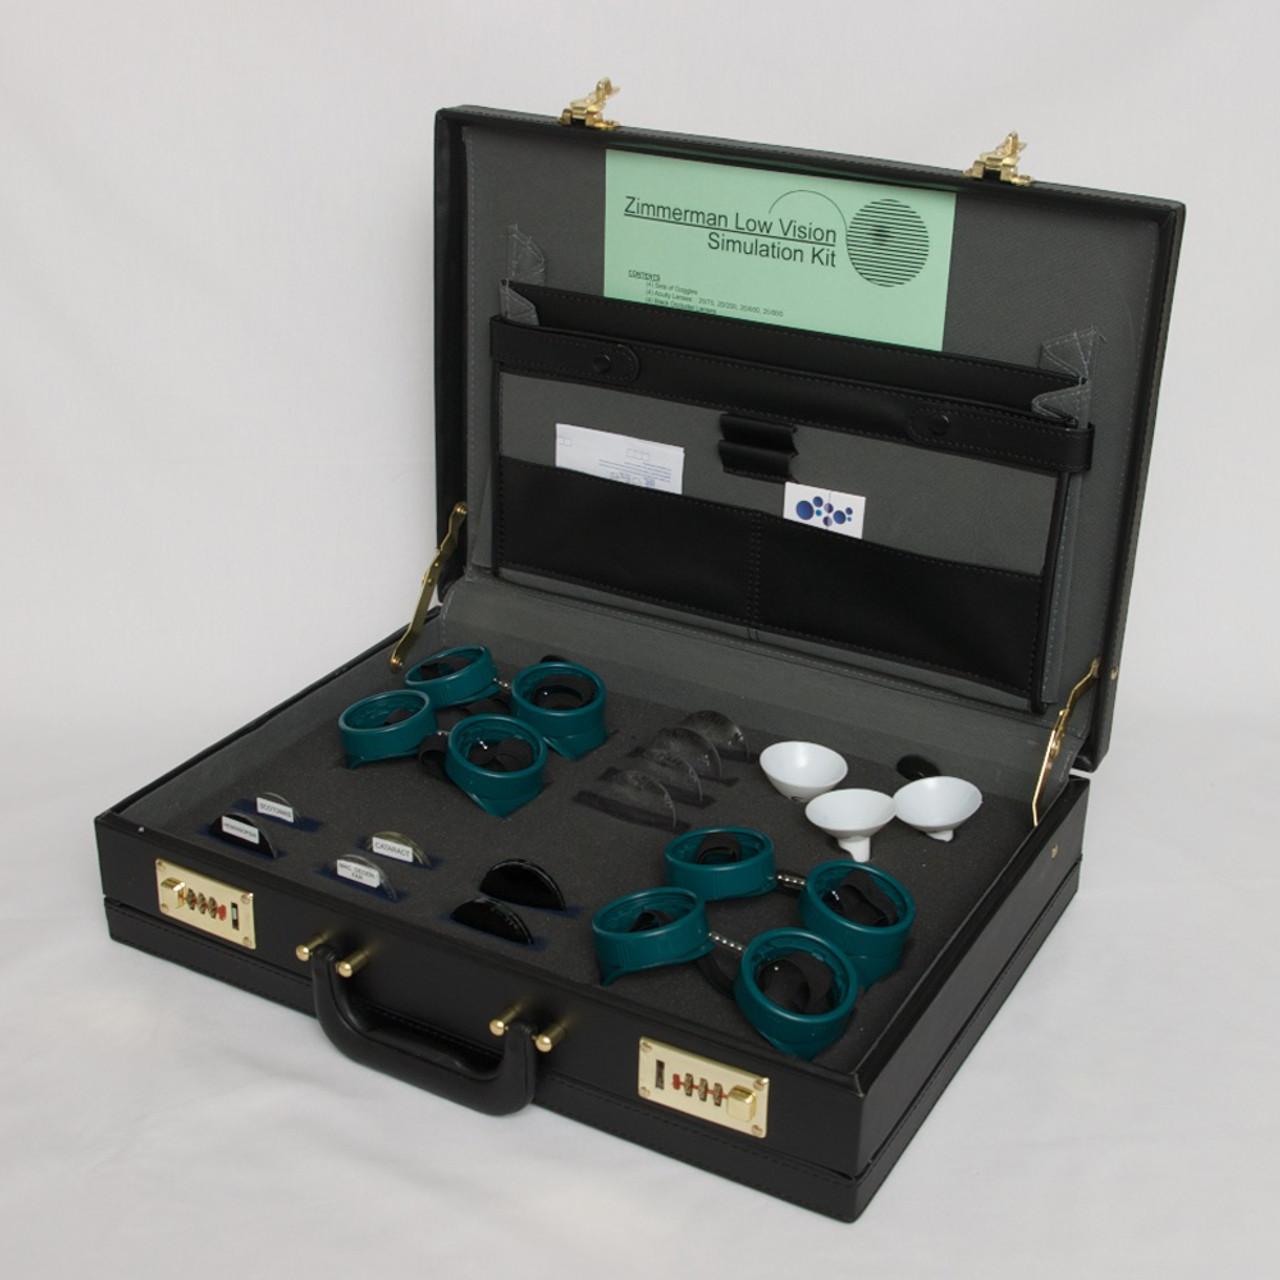 Zimmerman Low Vision Simulation Kit